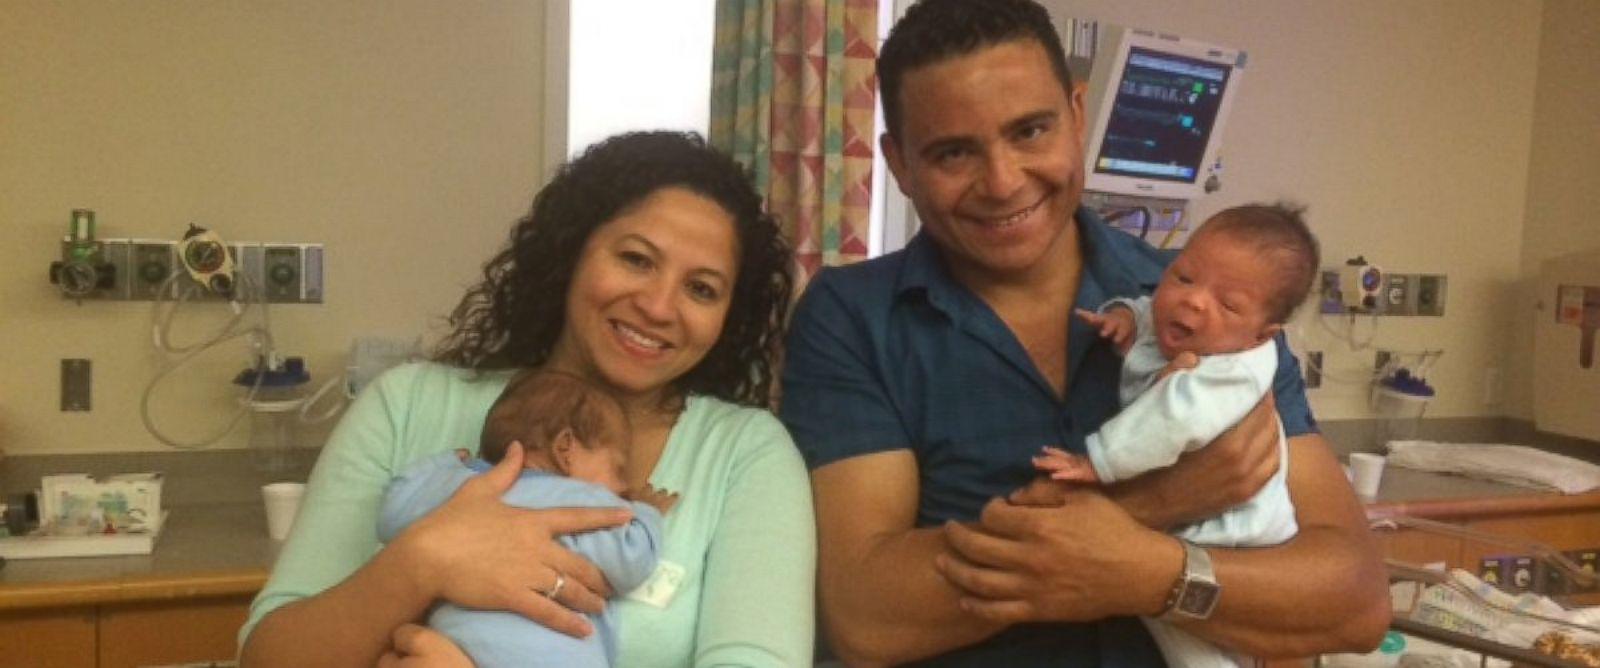 PHOTO: Twins boys Alexandre and Ronaldo were born 24 days apart.